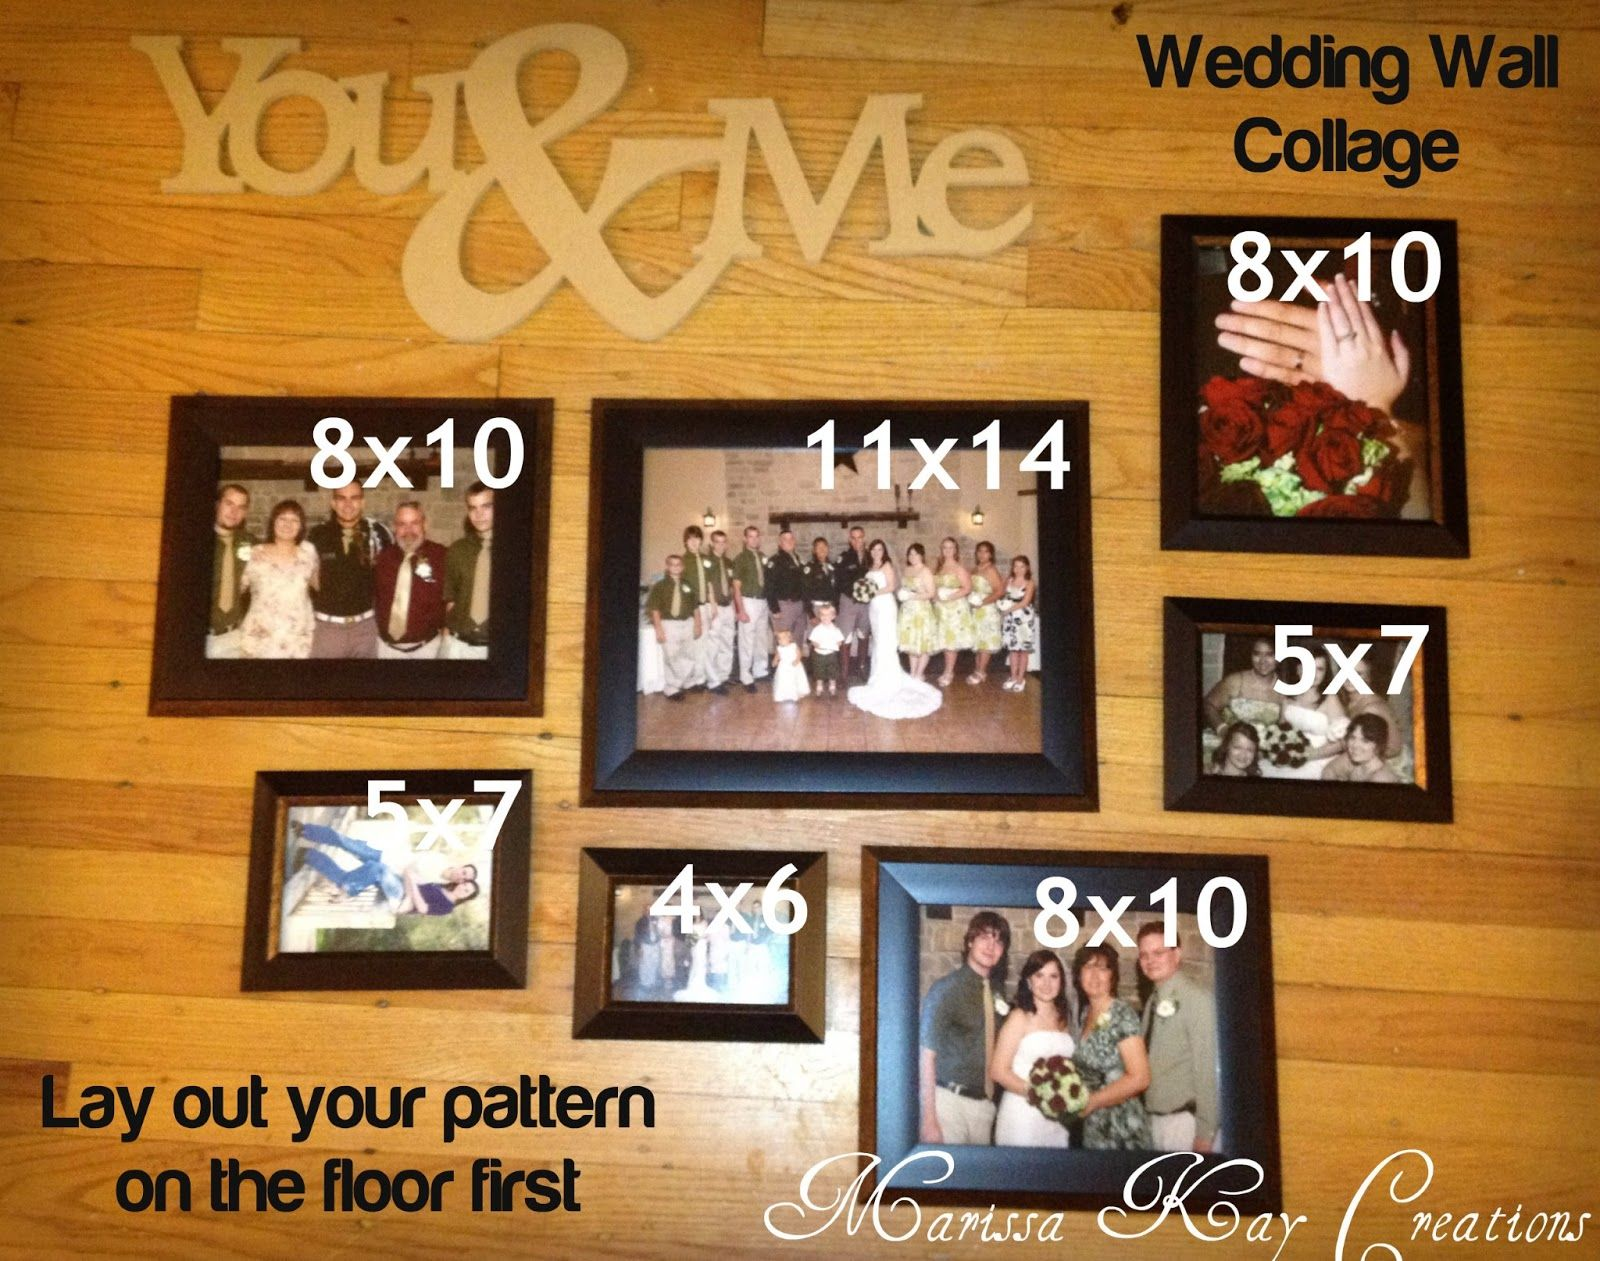 Marissa Kay Creations: Wedding Wall Collage